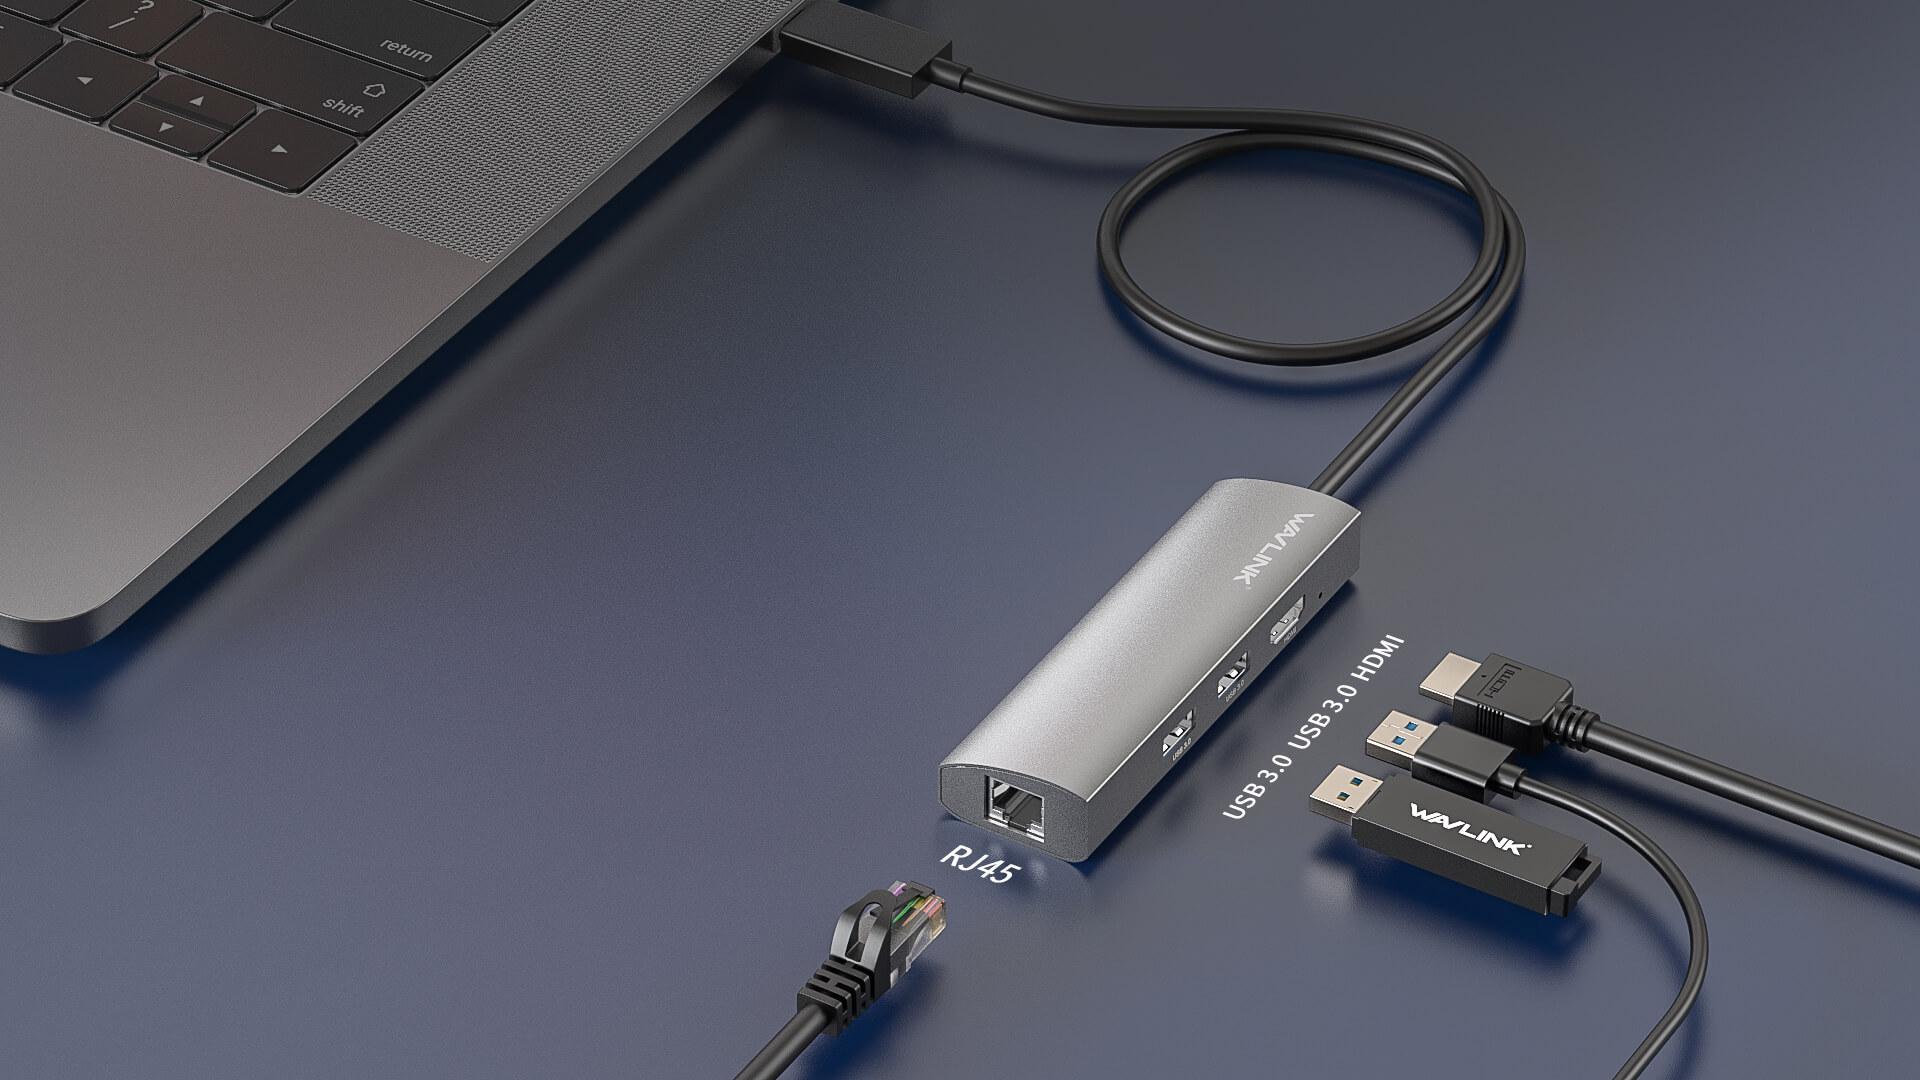 WAVLINK USB-C 3.1 TRAVELLING MINI DOCK WITH GIGABIT ETHERNET pc2 5